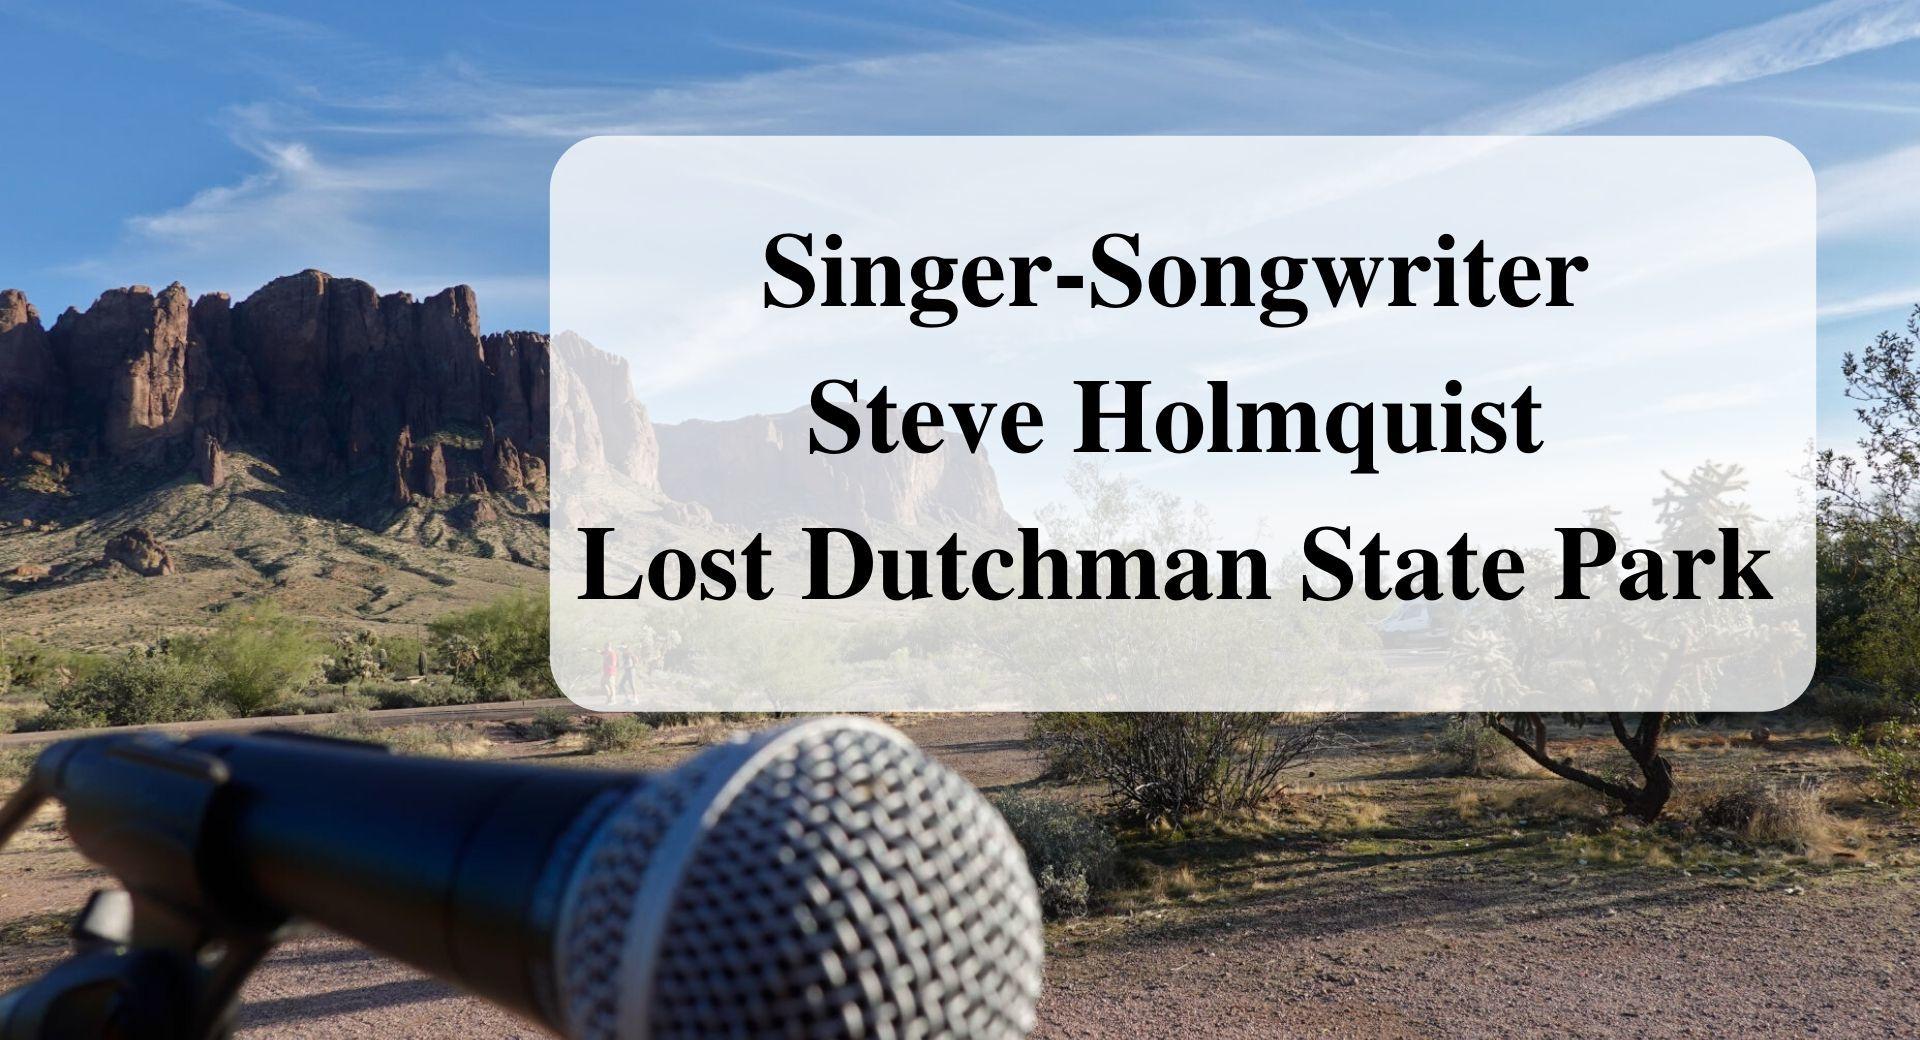 Singer-Songwriter Steve Holmquist Lost Dutchman State Park Forever Sabbatical